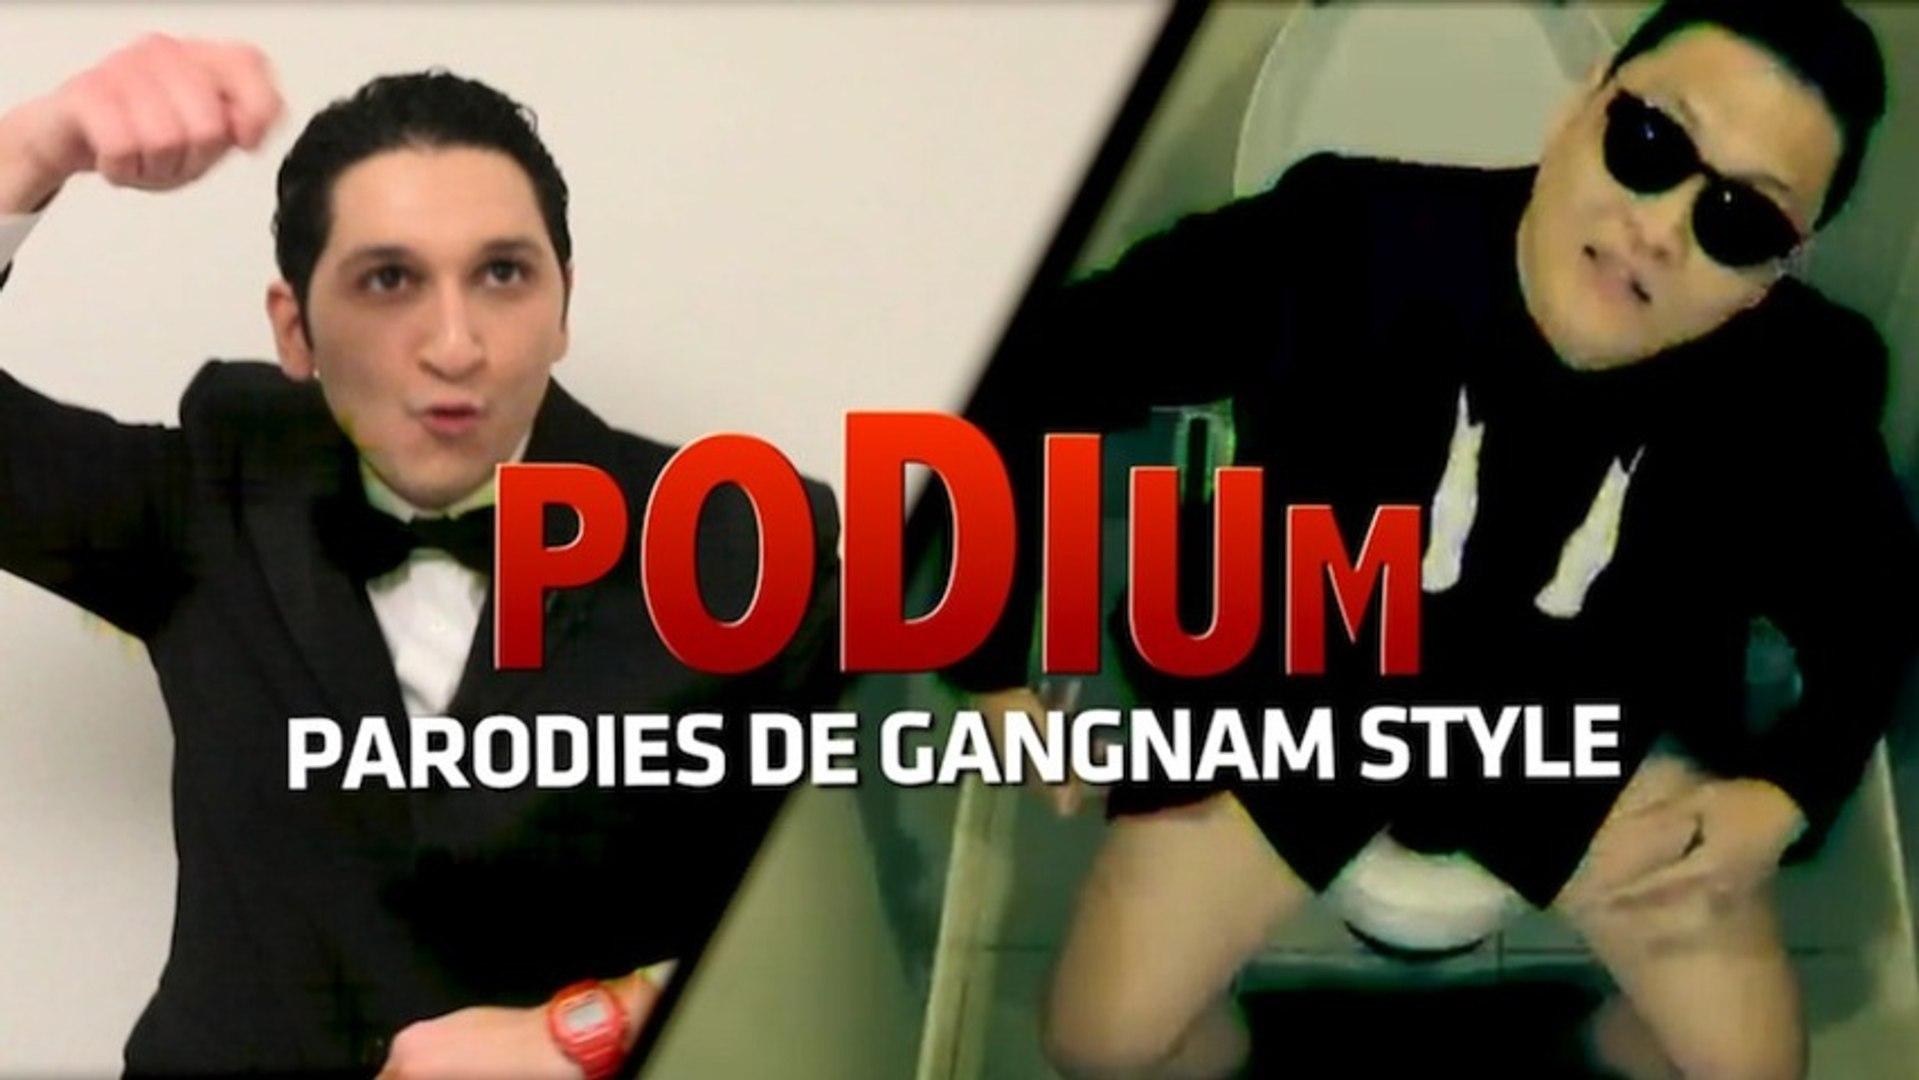 PODIUM #01  Les parodies du Gangnam Style